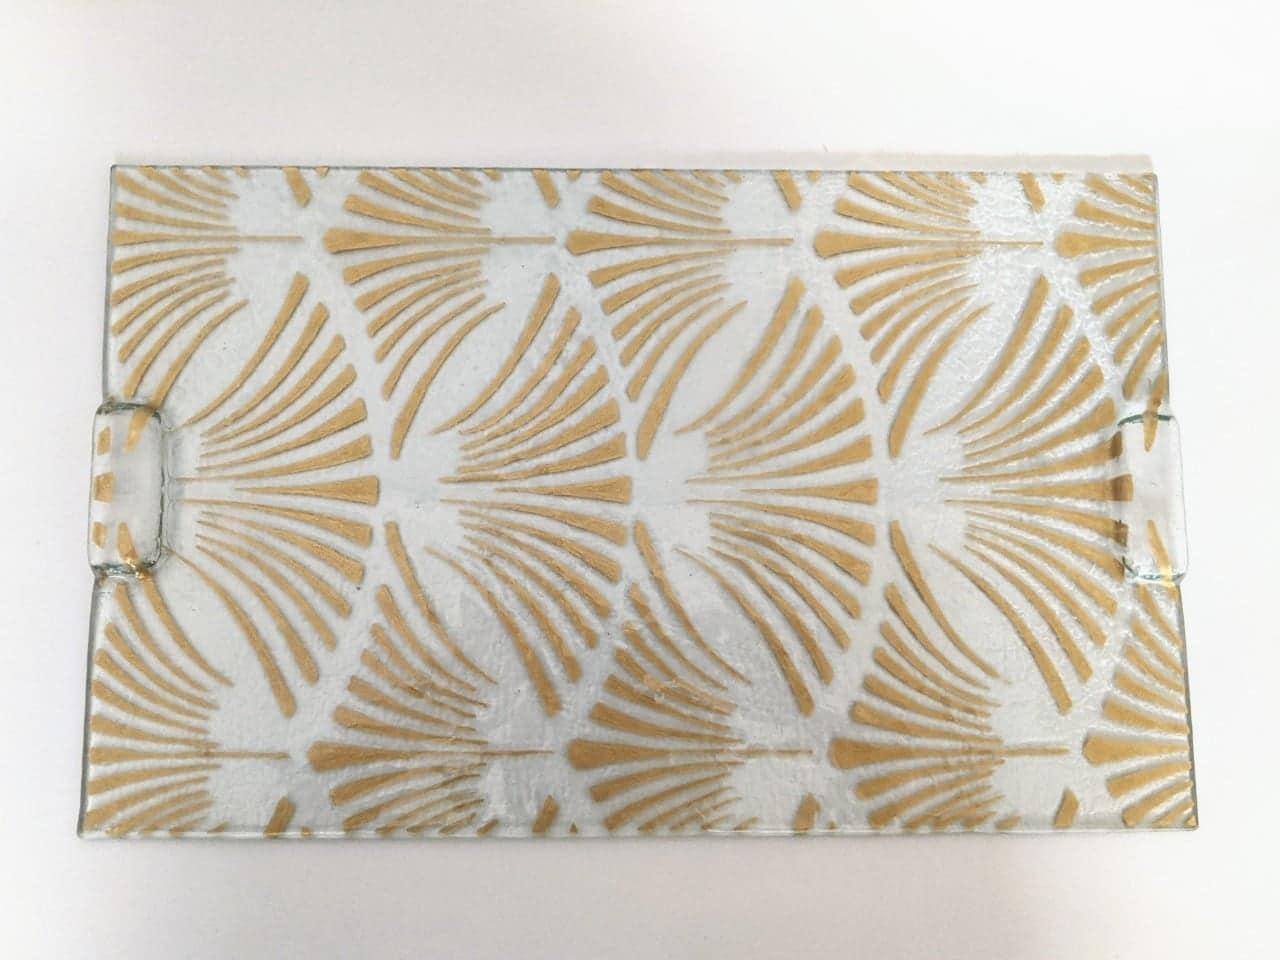 Rectangular Cheese Platter